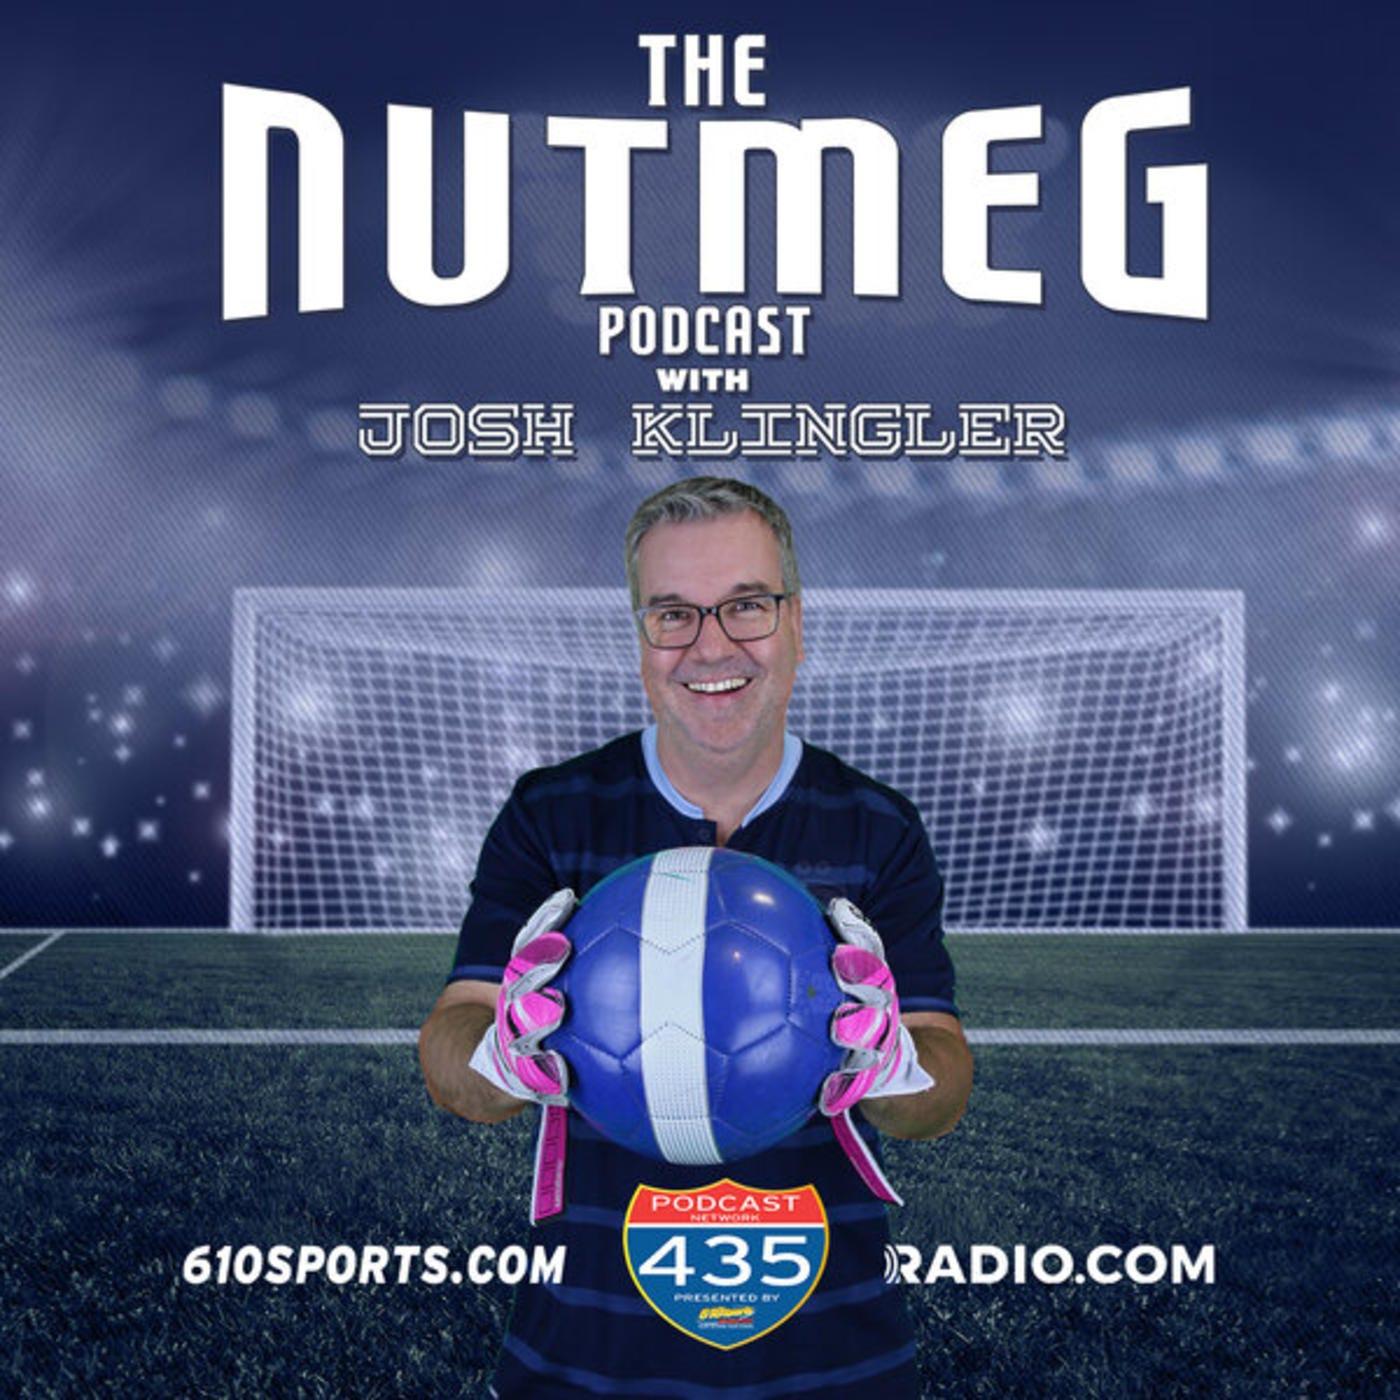 The Nutmeg Podcast with Josh Klingler